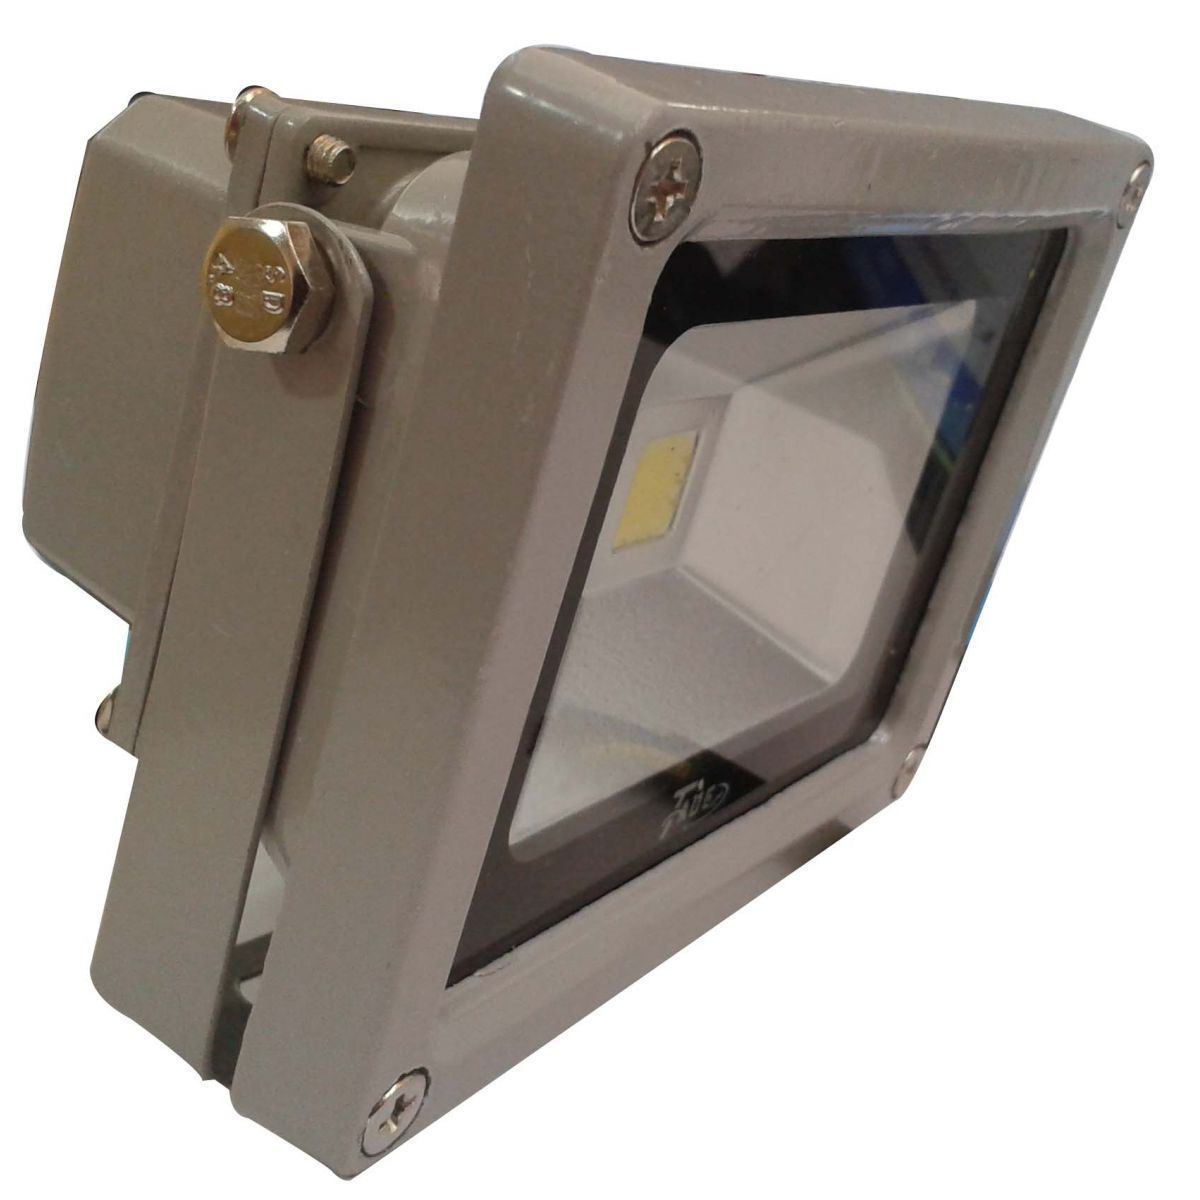 Refletor e Holofote 10 W - Frete Grátis  - Thata Esportes